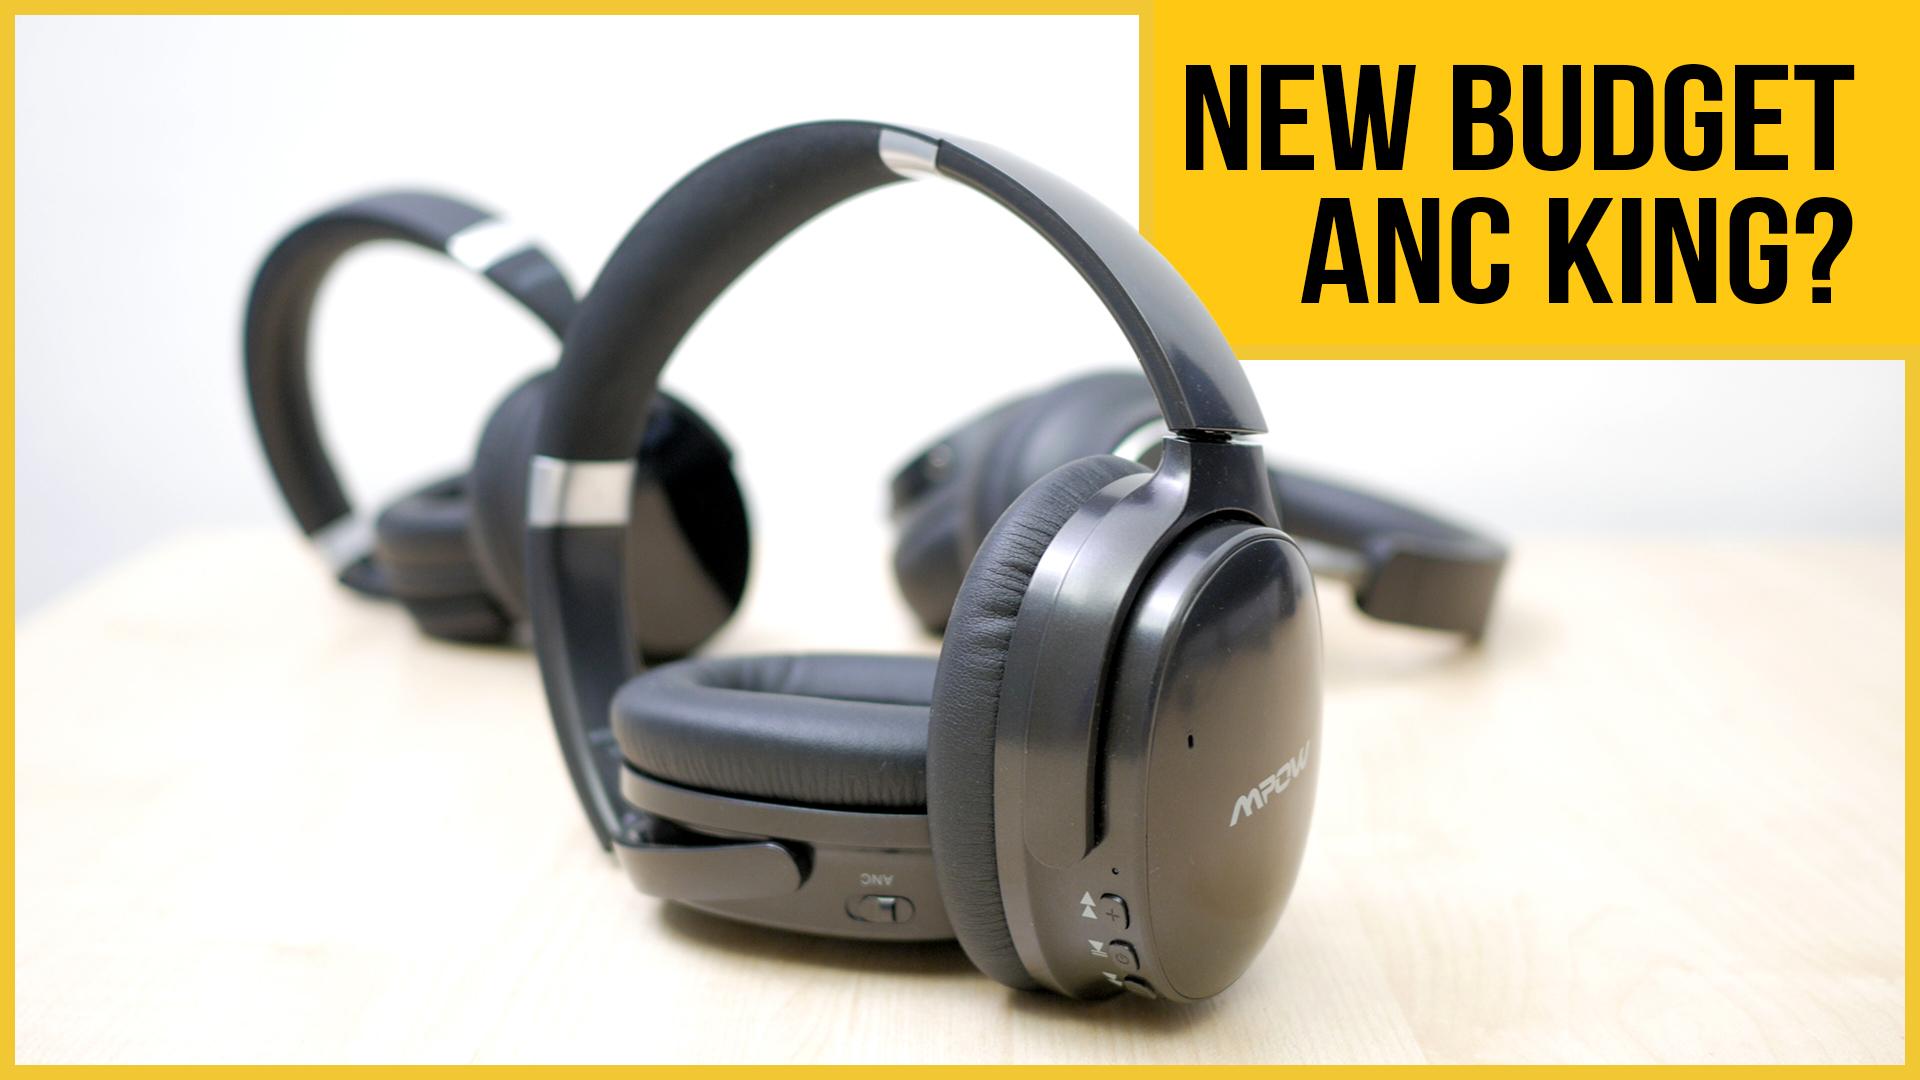 Mpow H10 Active Noise Cancelling Anc Wireless Headphones Review Vs H5 Vs Taotronics Bh046